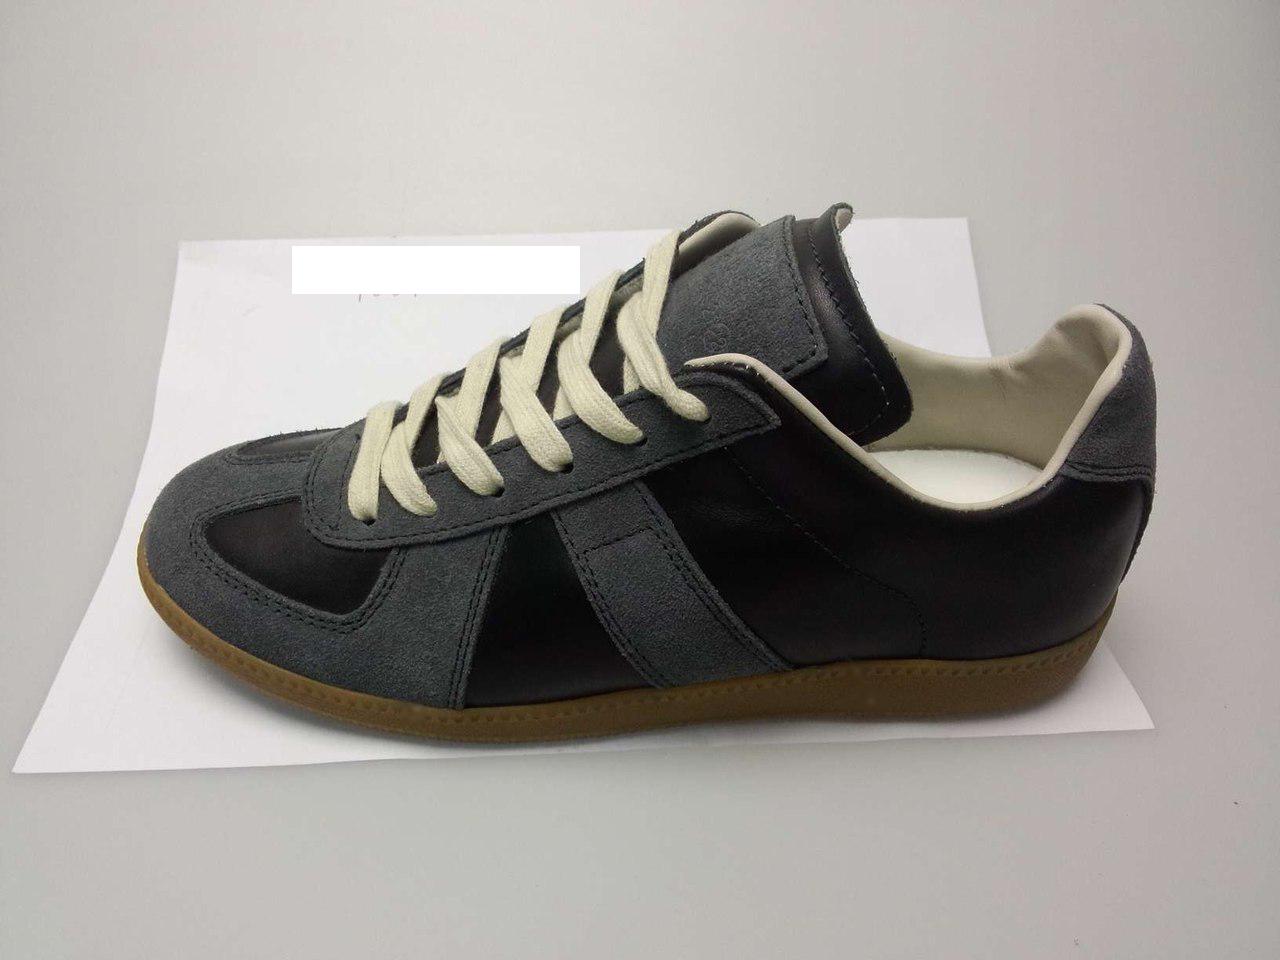 0dd75d0e5fb is it original Maison Martin Margiela Sneaker or not ? | Styleforum